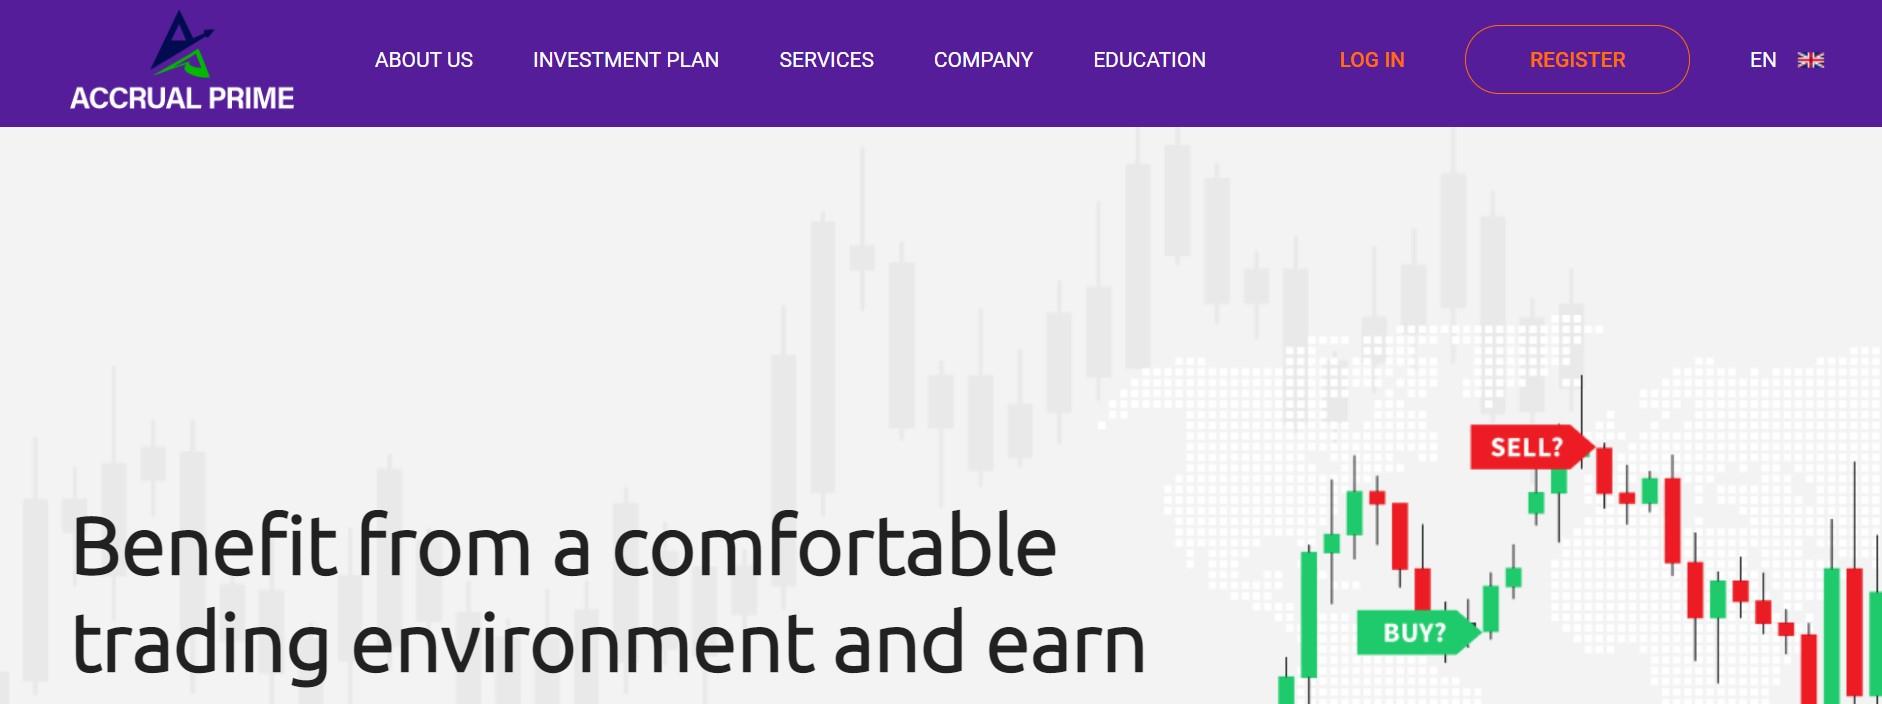 Accrual Prime website